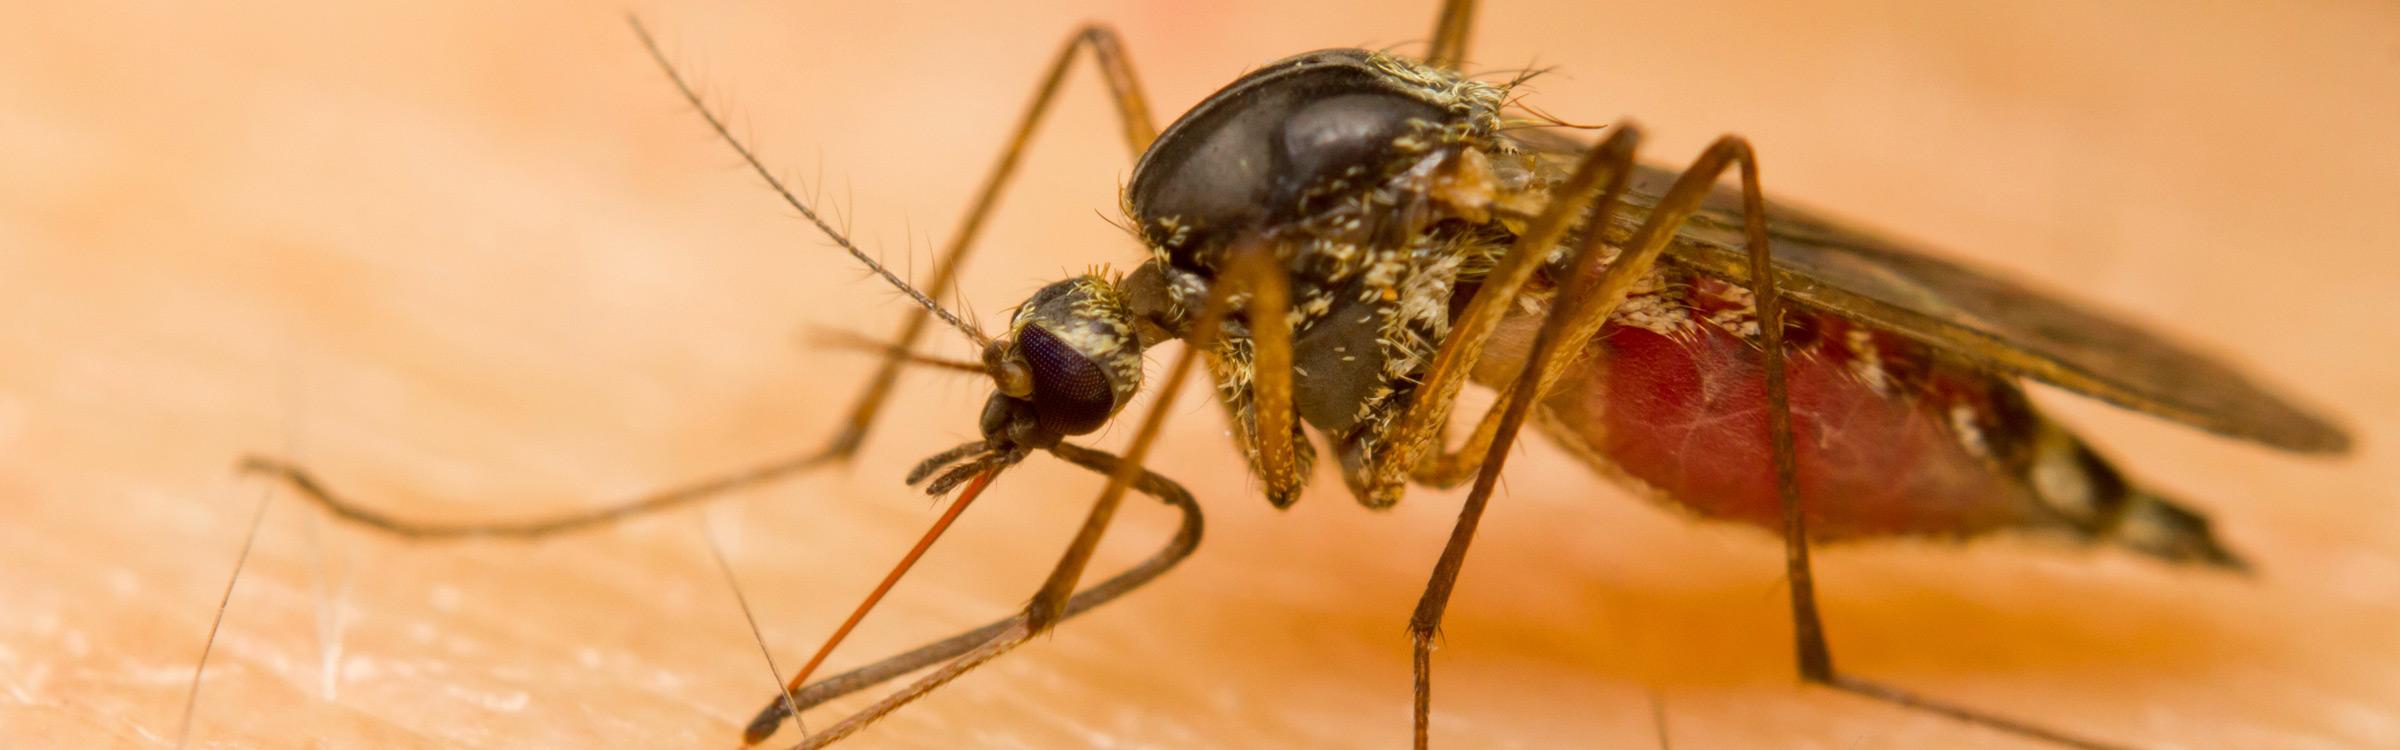 Muggenplaag2